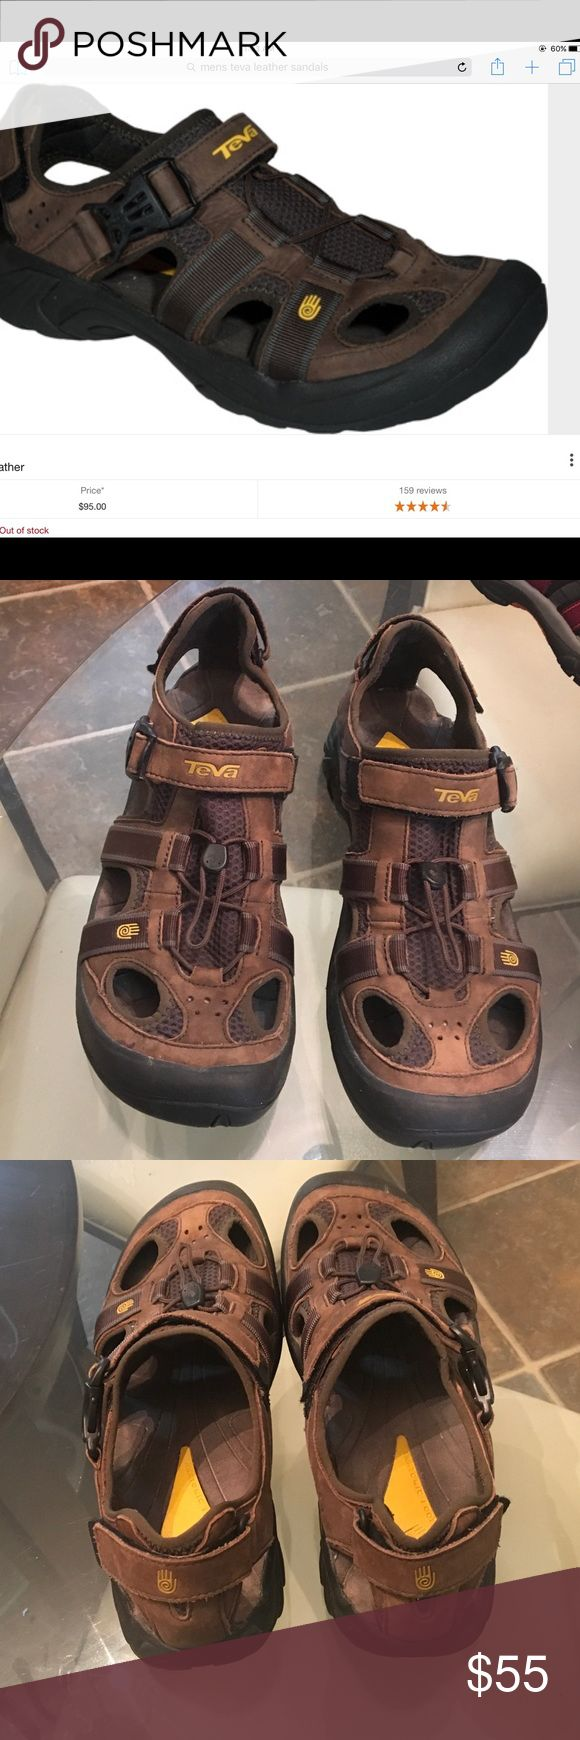 Men's teva sandles sz 13 Men's teva sandles in excellent used condition sz13 teva Shoes Sandals & Flip-Flops